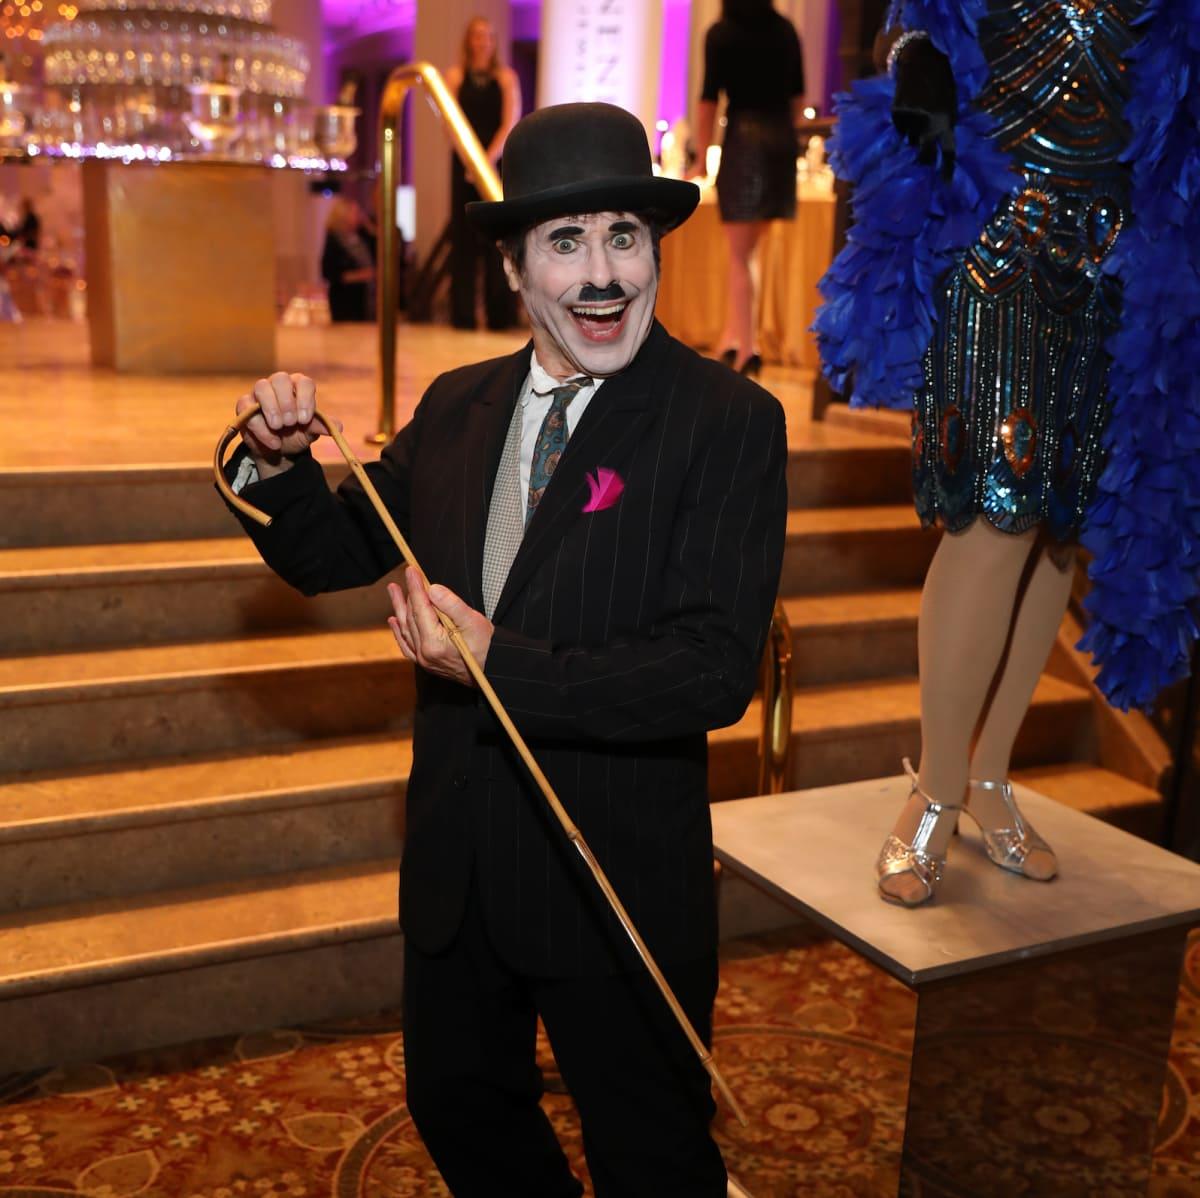 Houston, March of Dimes Signature Chefs, November 2017, Charlie Chaplin impersonator